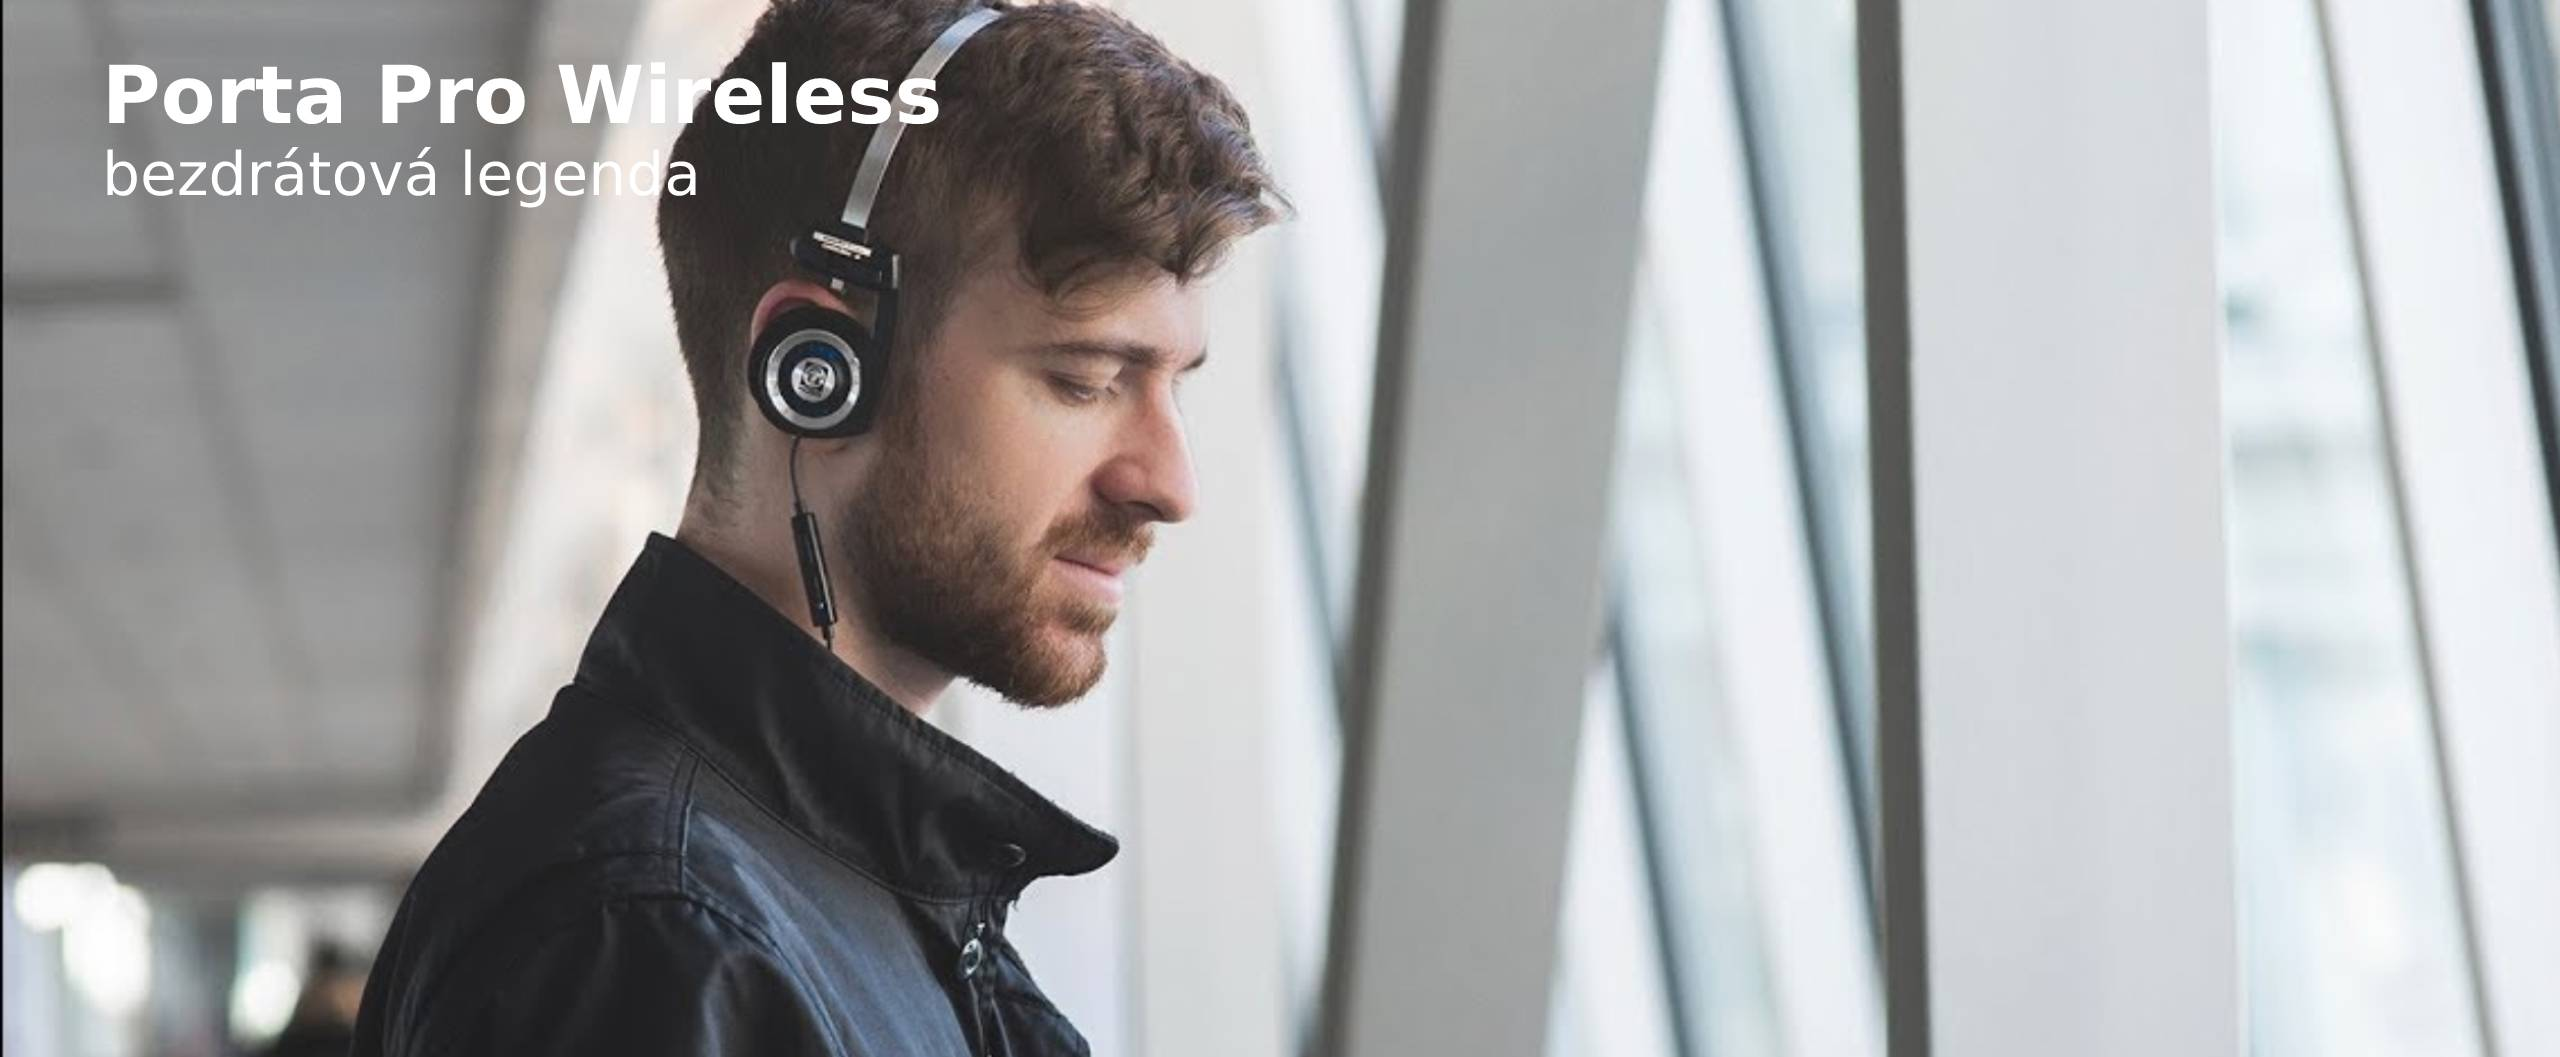 Porta Pro Wireless